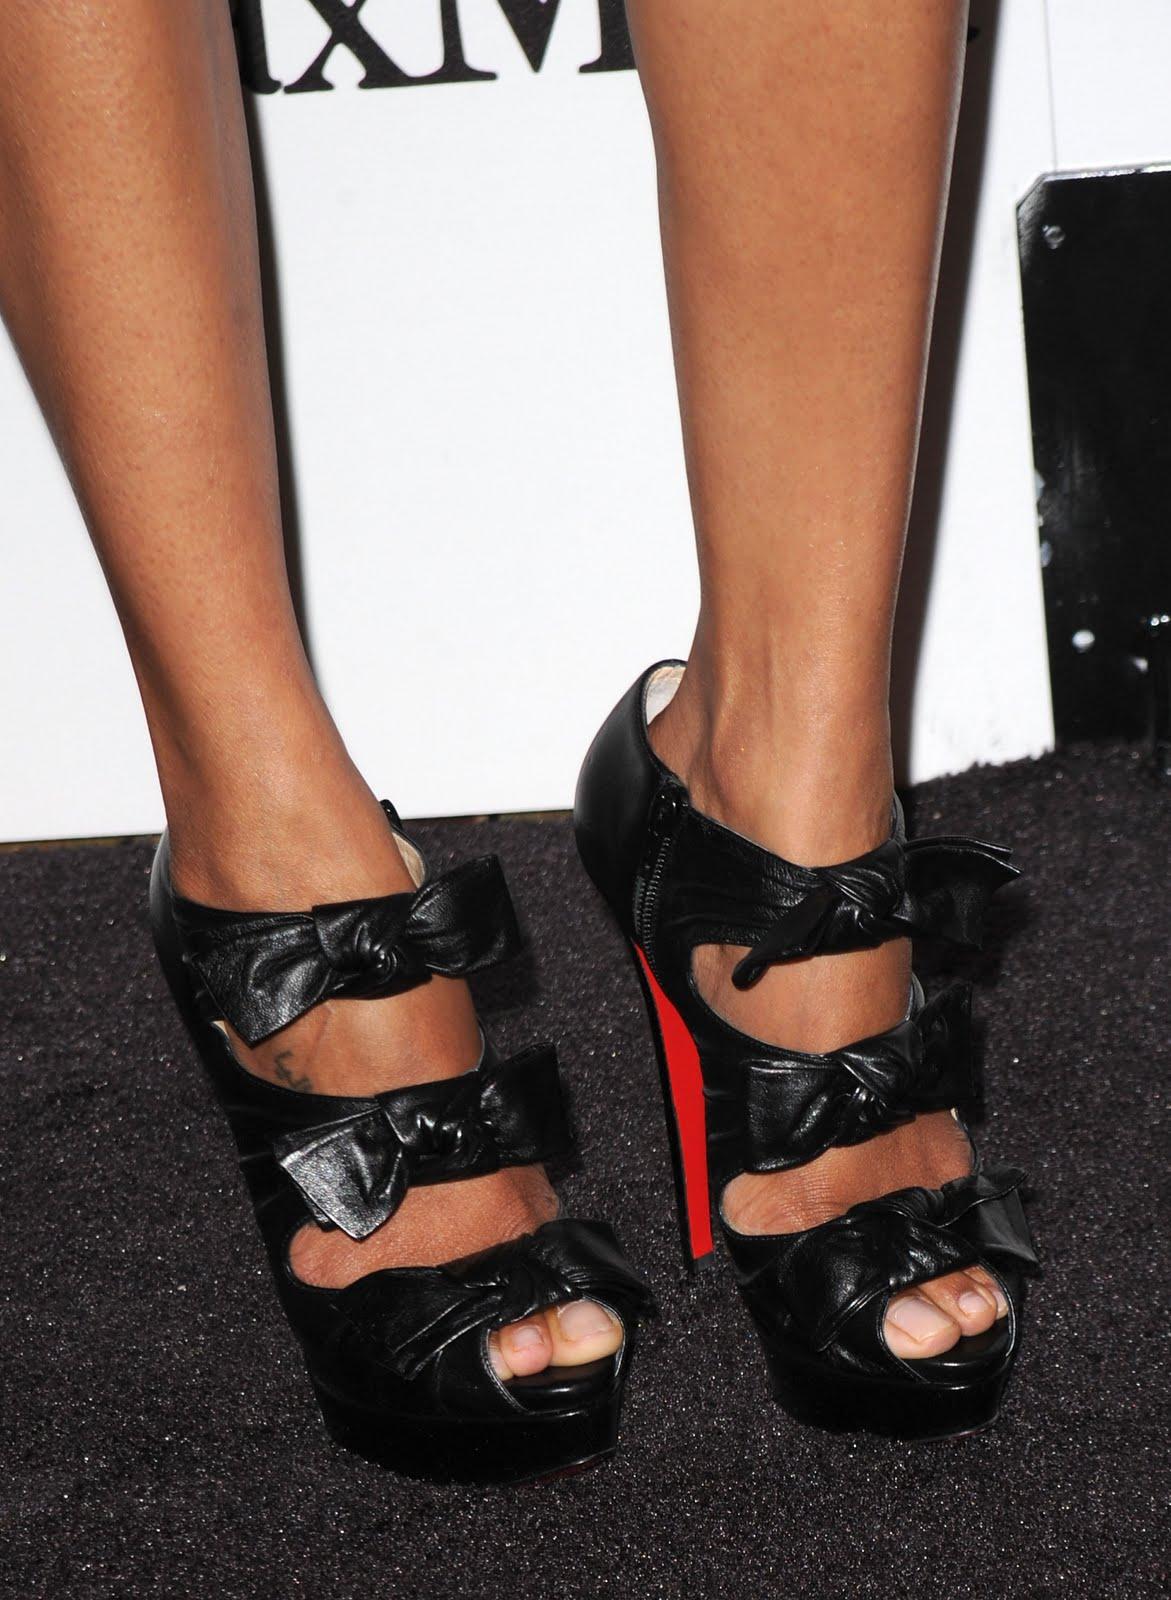 zoe-saldana-feet jpgZoe Saldana Feet